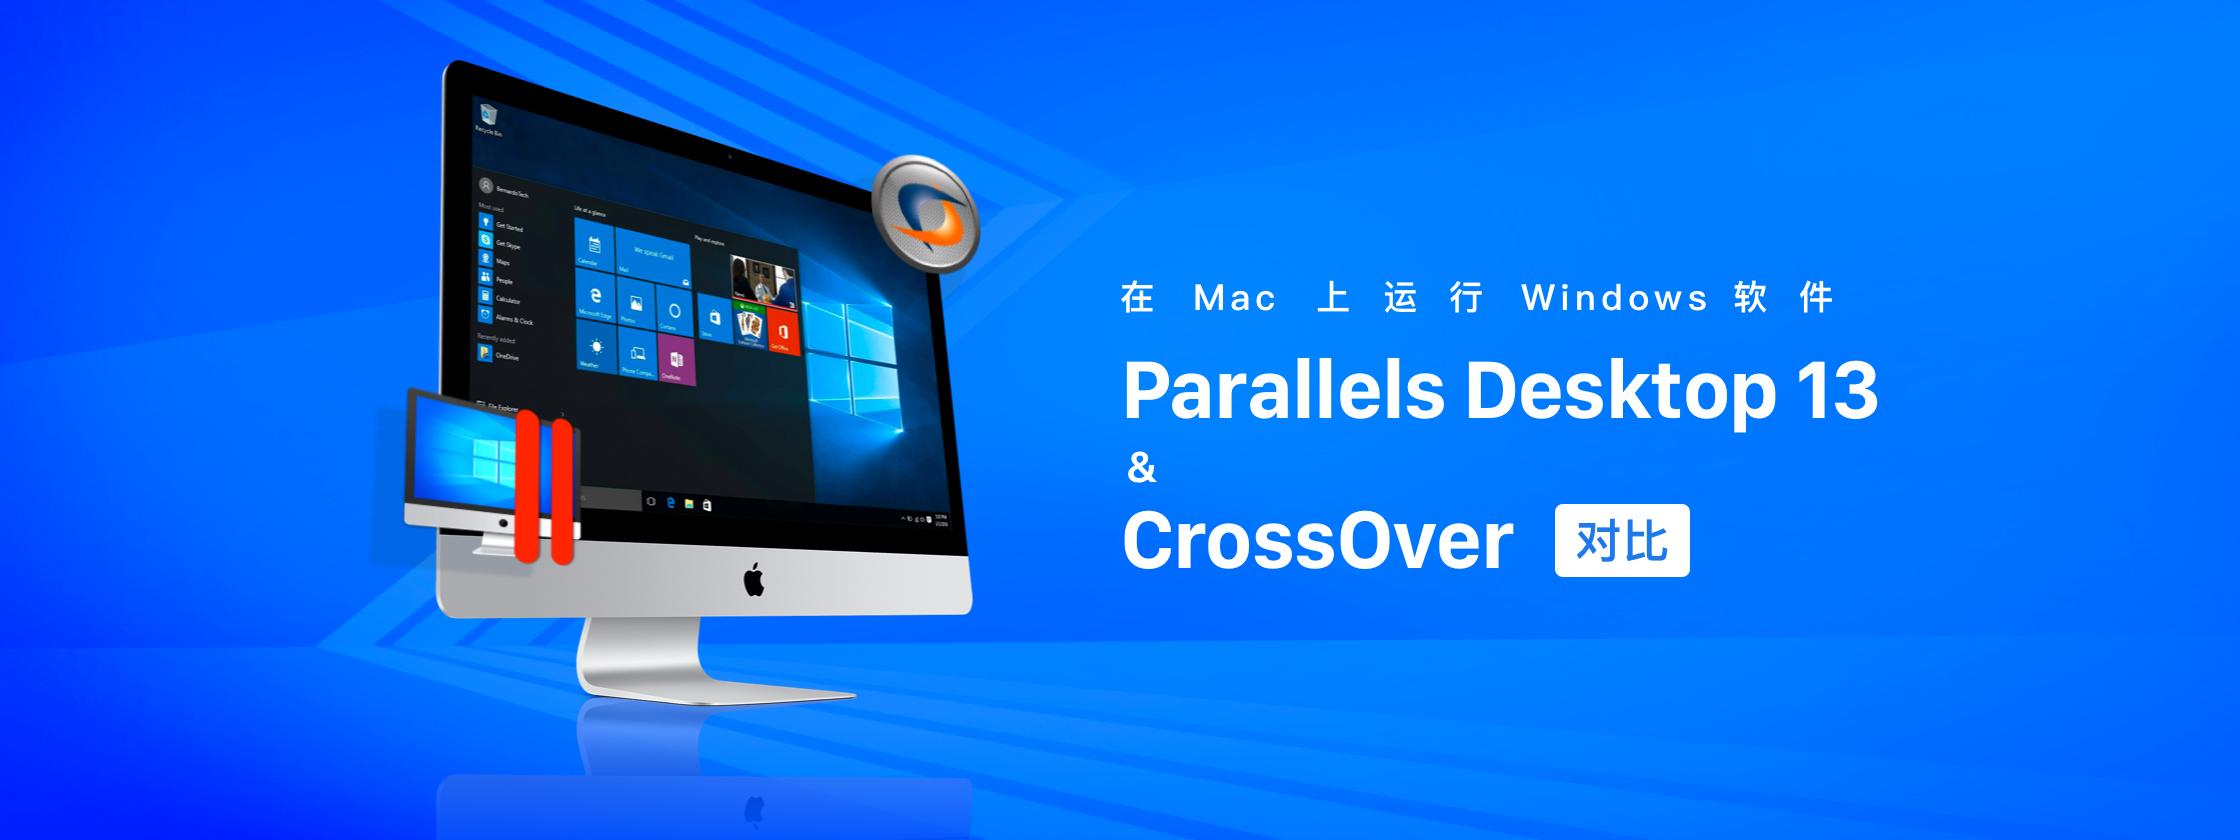 Mac 运行 Windows 软件,Parallels Desktop 和 CrossOver 哪一款更适合你?